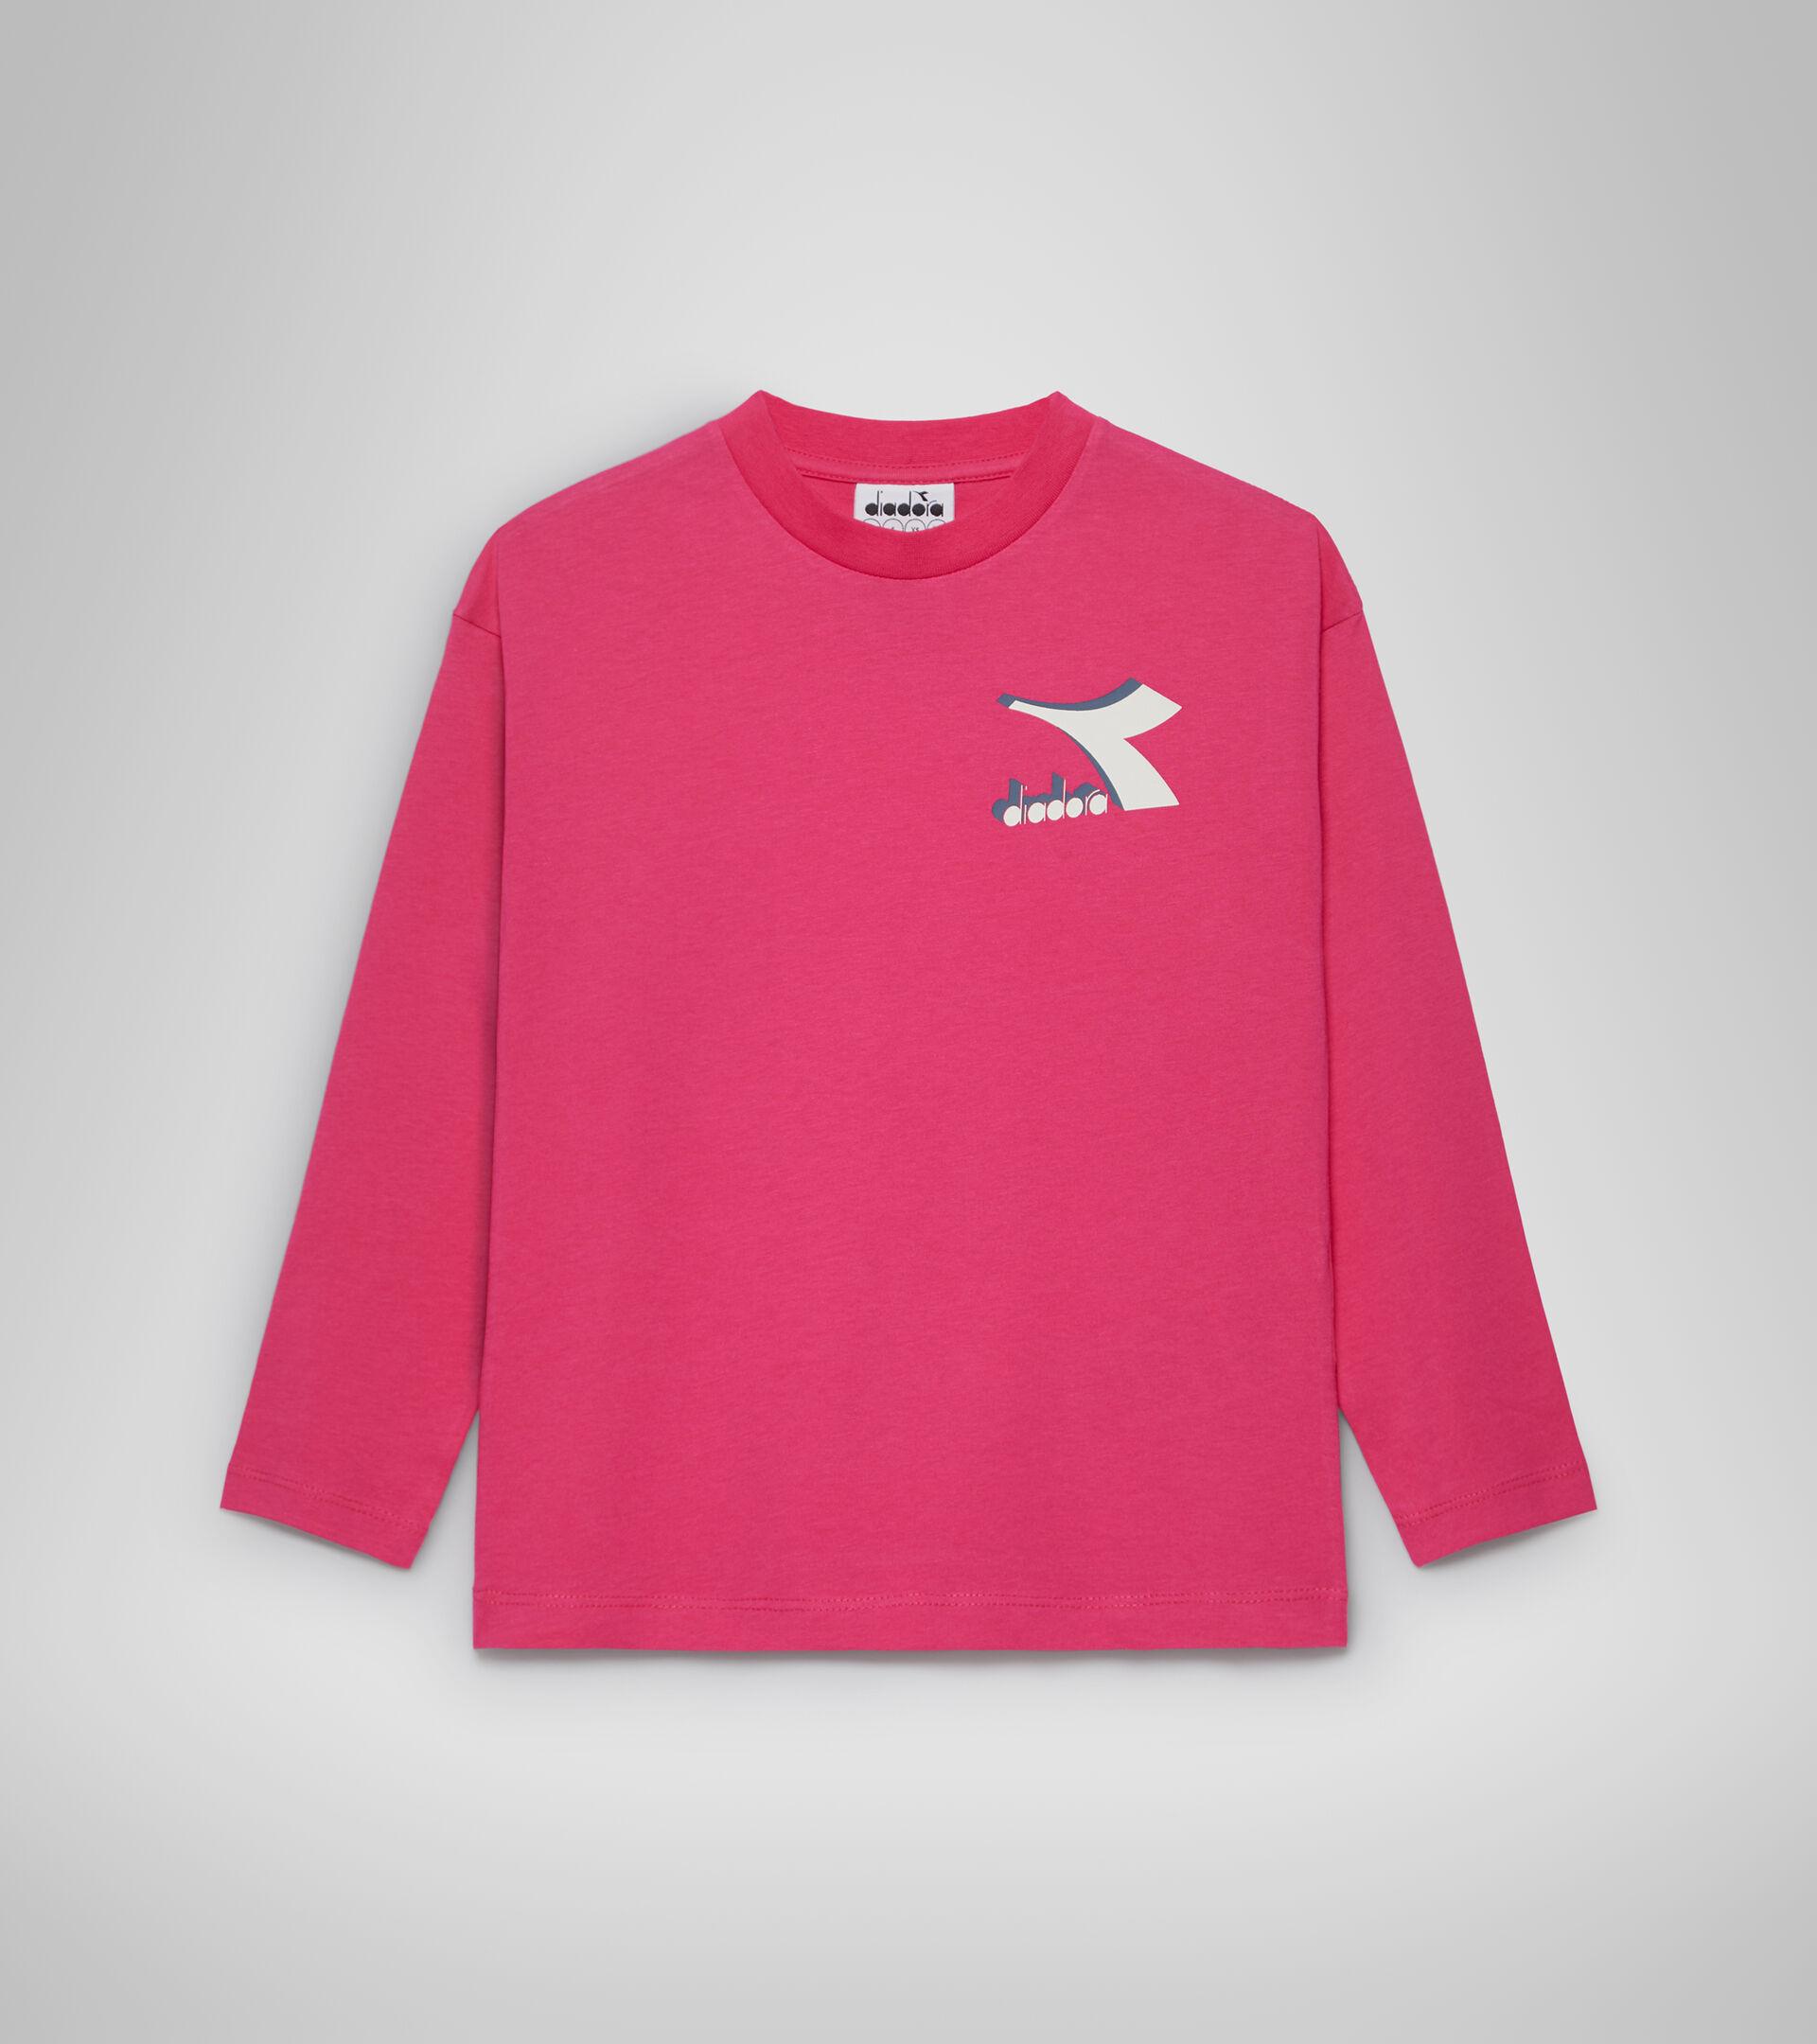 T-shirt - Bambini/e JU.LS T-SHIRT CUBIC ROSA MAGENTA - Diadora